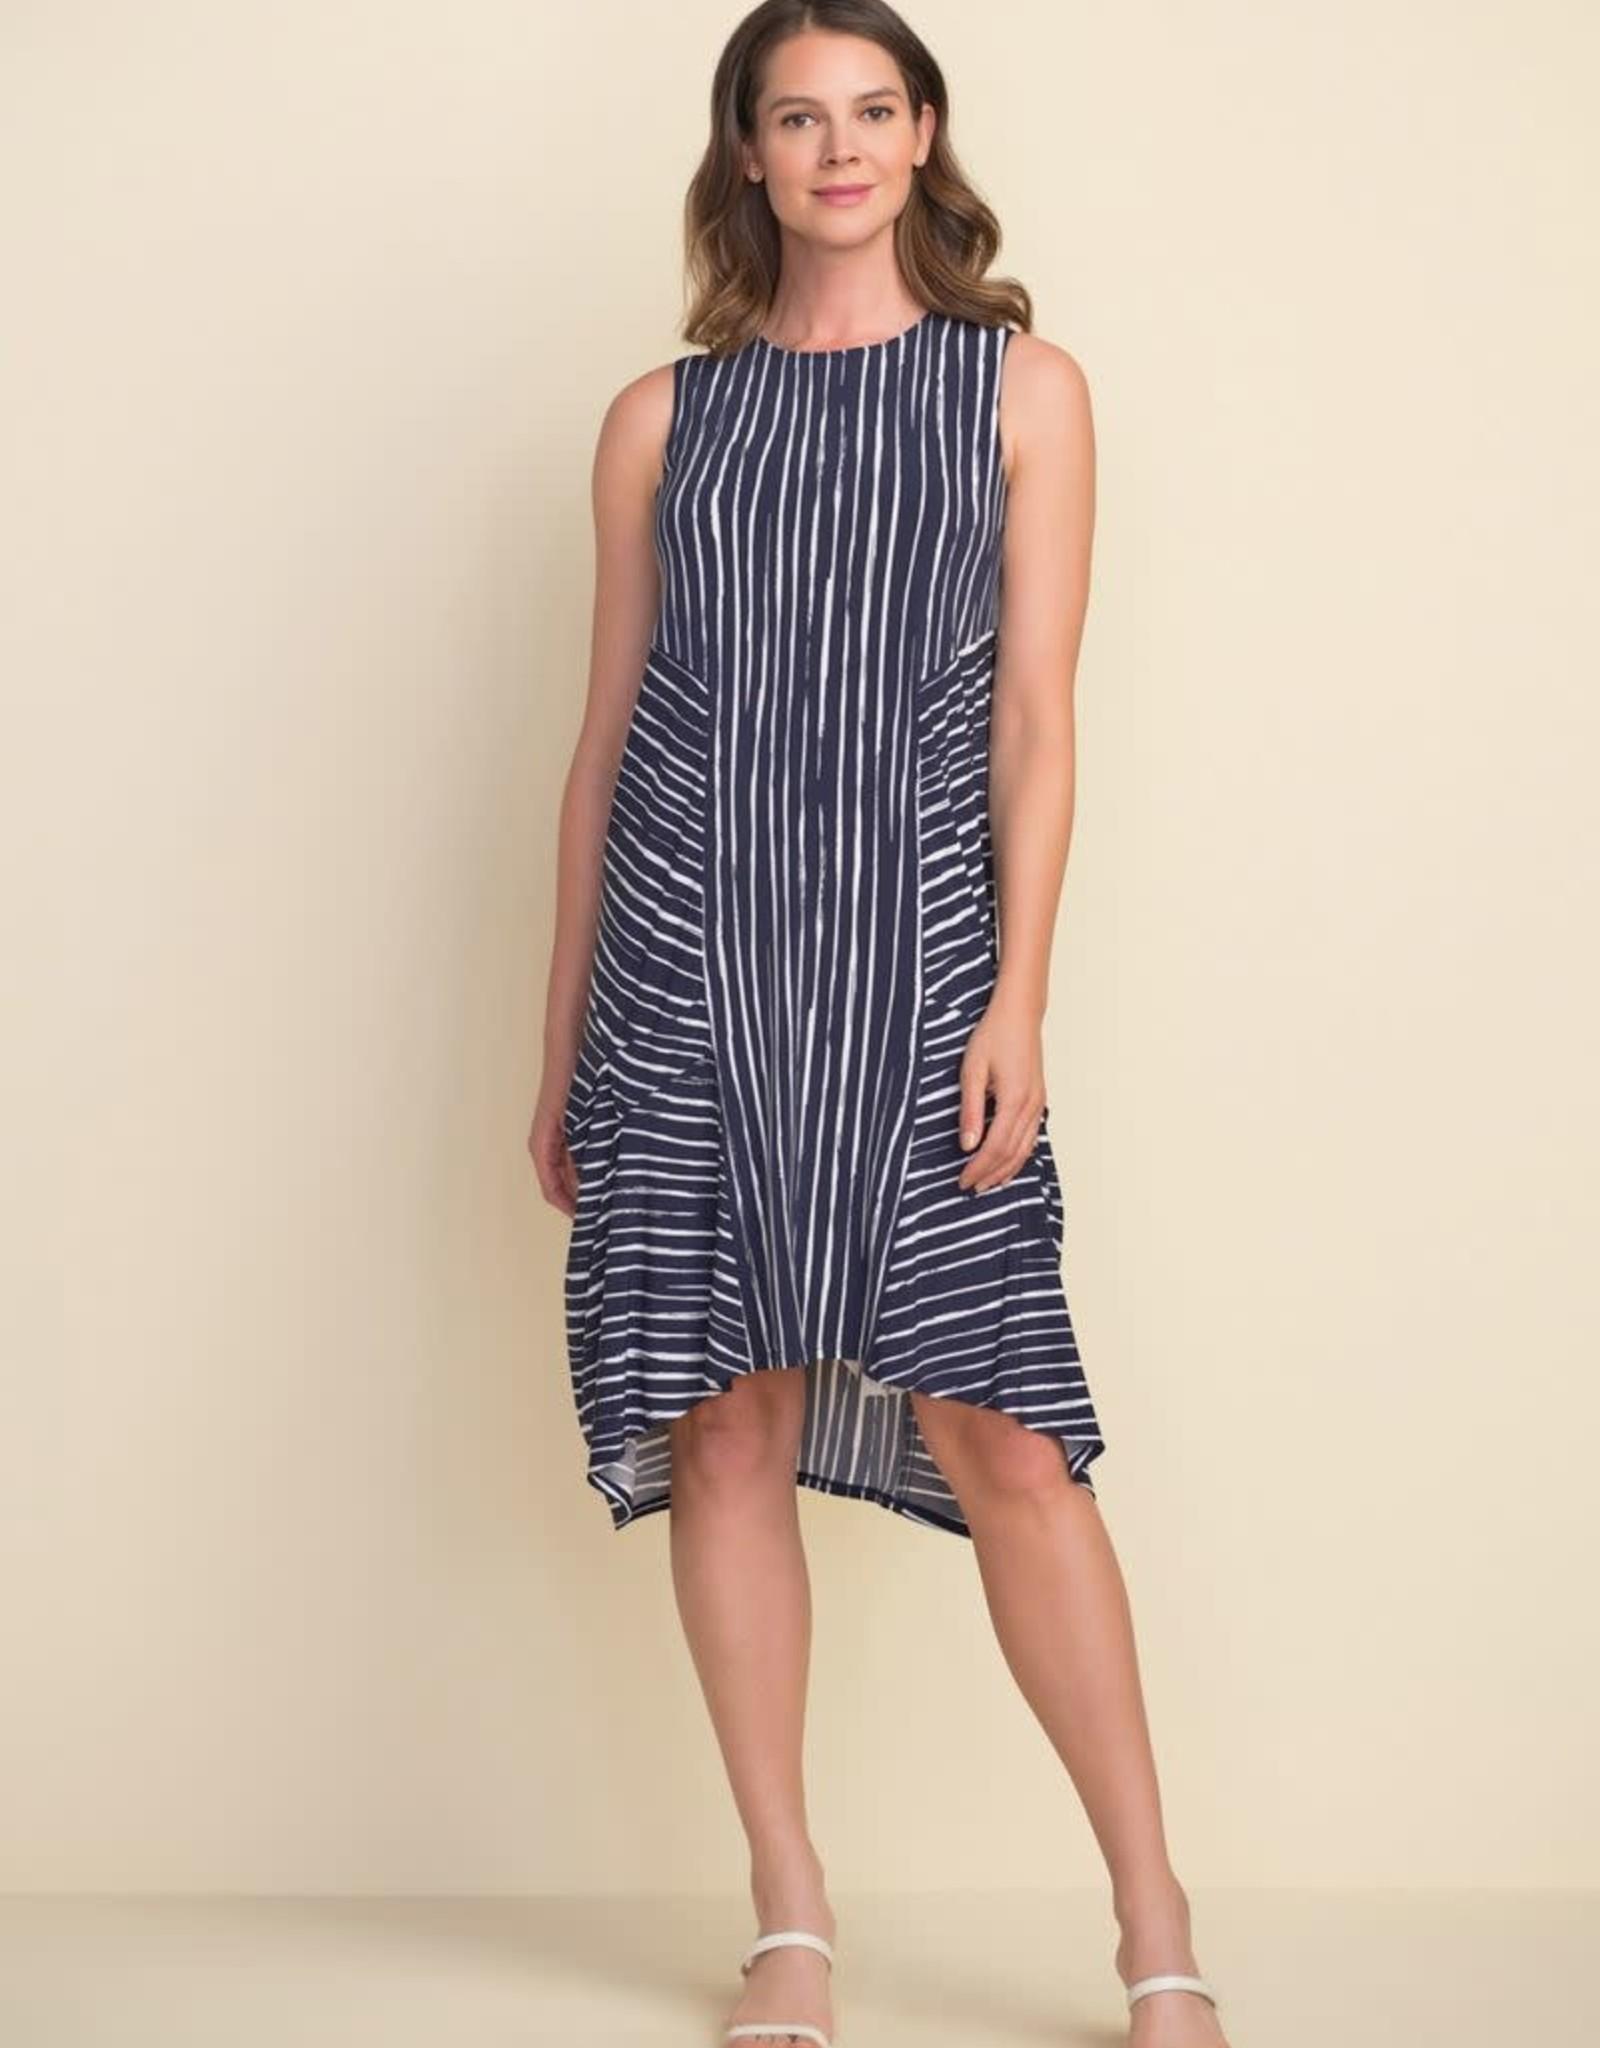 Joseph Ribkoff Sleeveless Striped Dress 212152